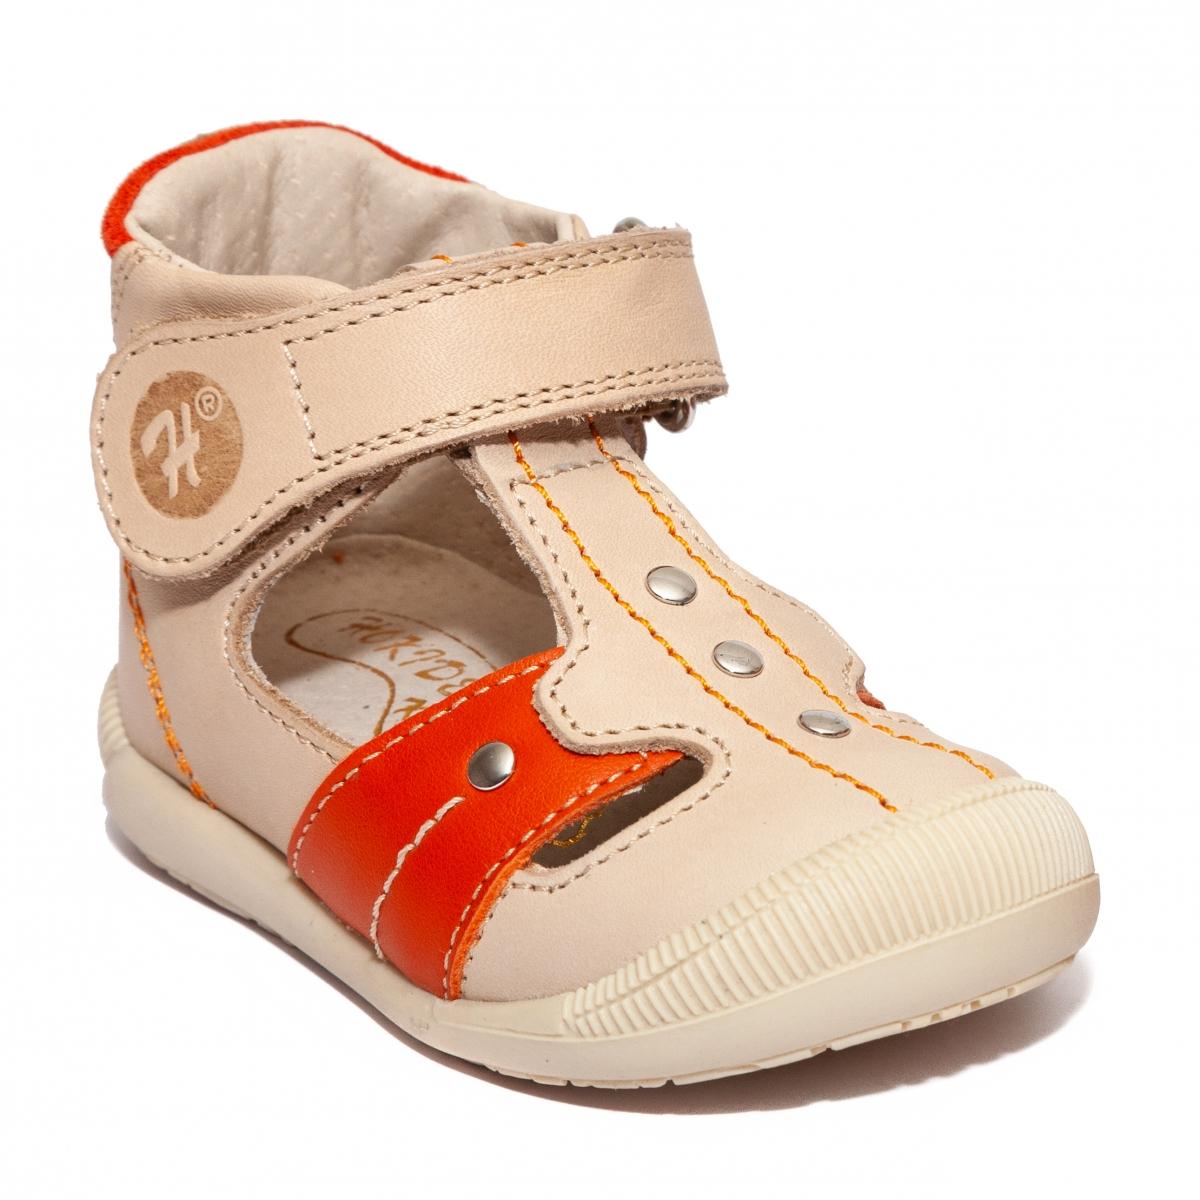 Sandale ortopedice copii hokide 273 bej portocaliu 18-24